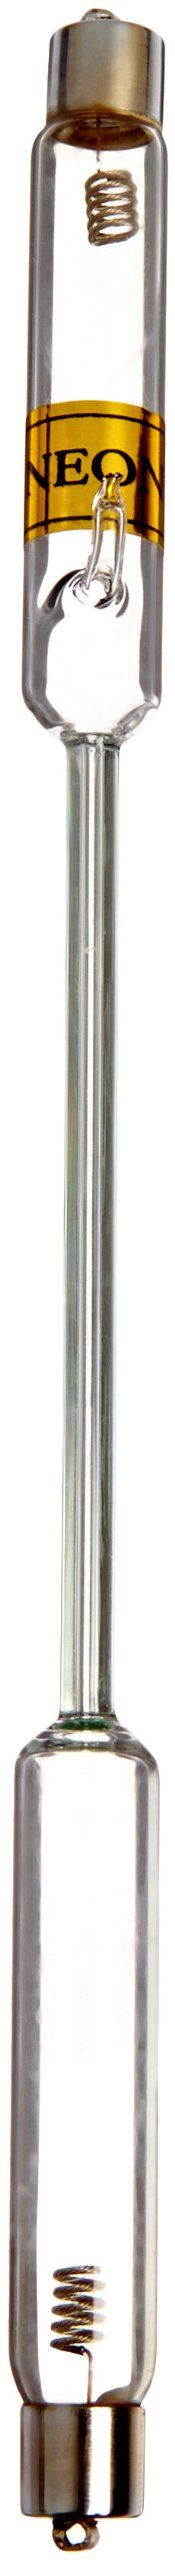 EISCO Premium Spectrum Tube, 26cm Height, Neon (Ne) by EISCO